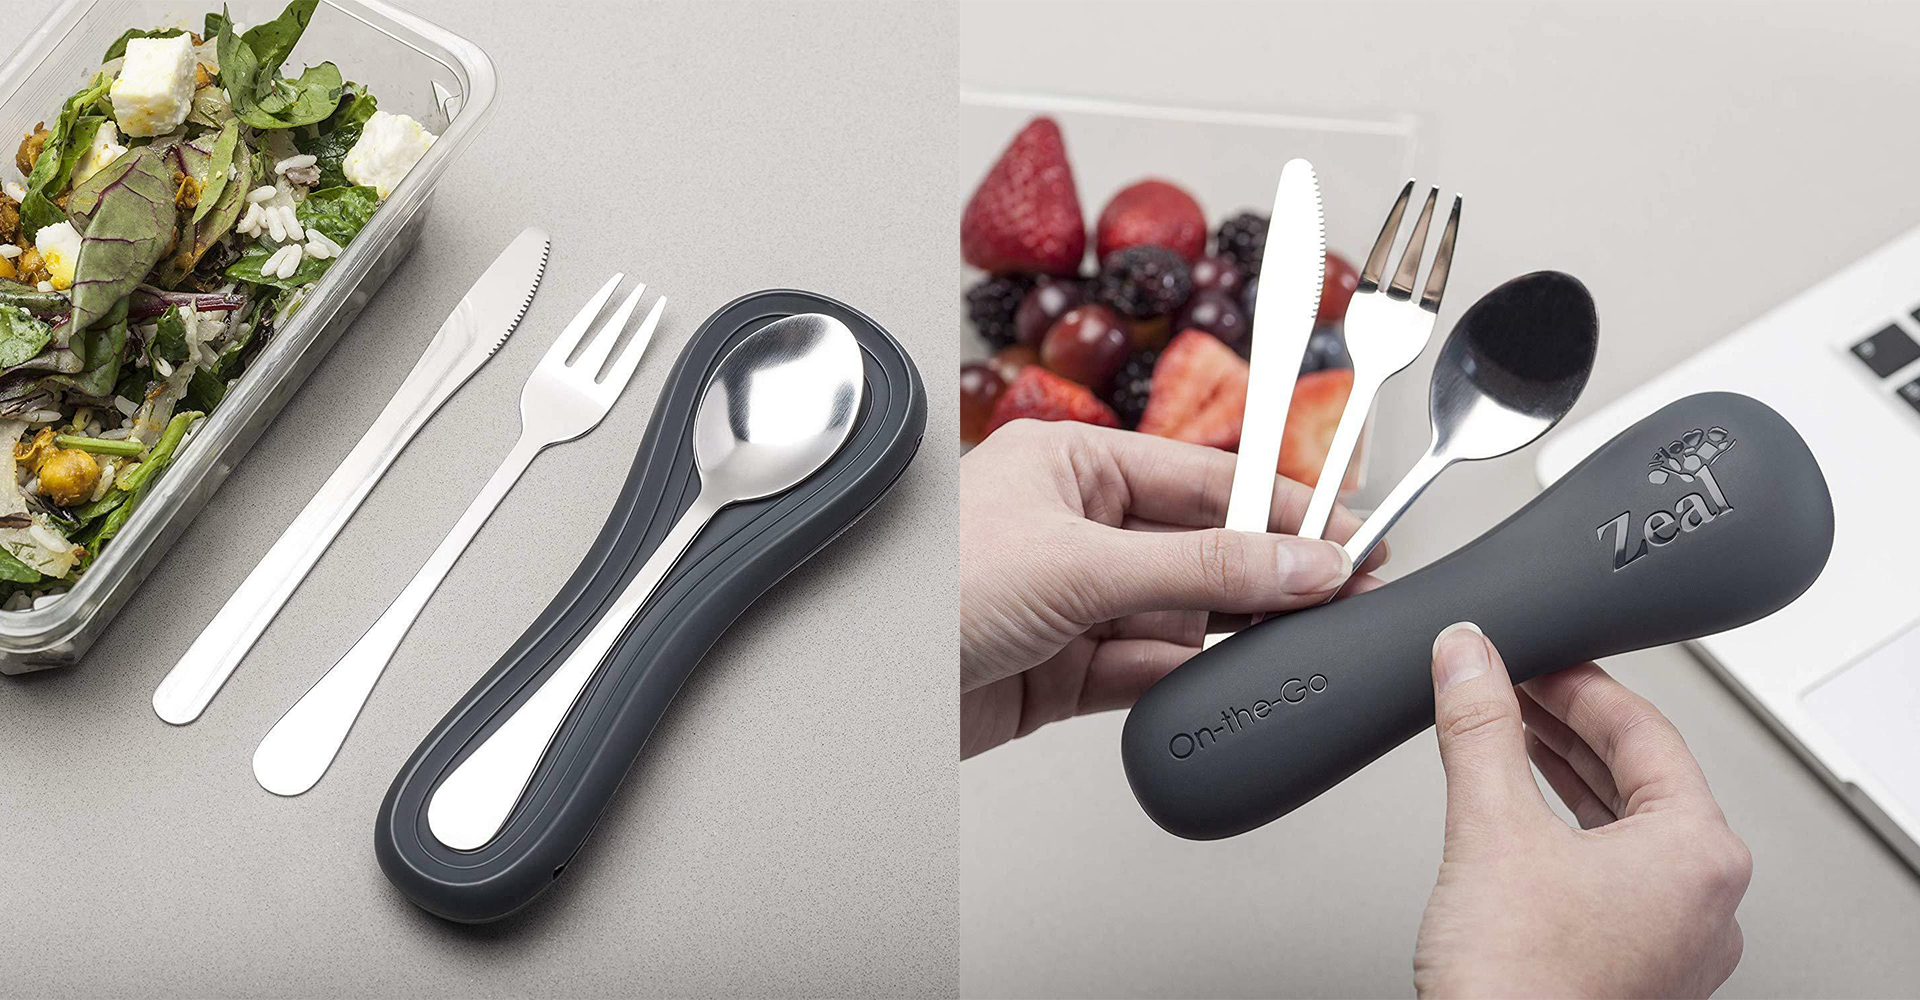 CKS Zeal 2018 range| On-the-go cutlery pouch black set